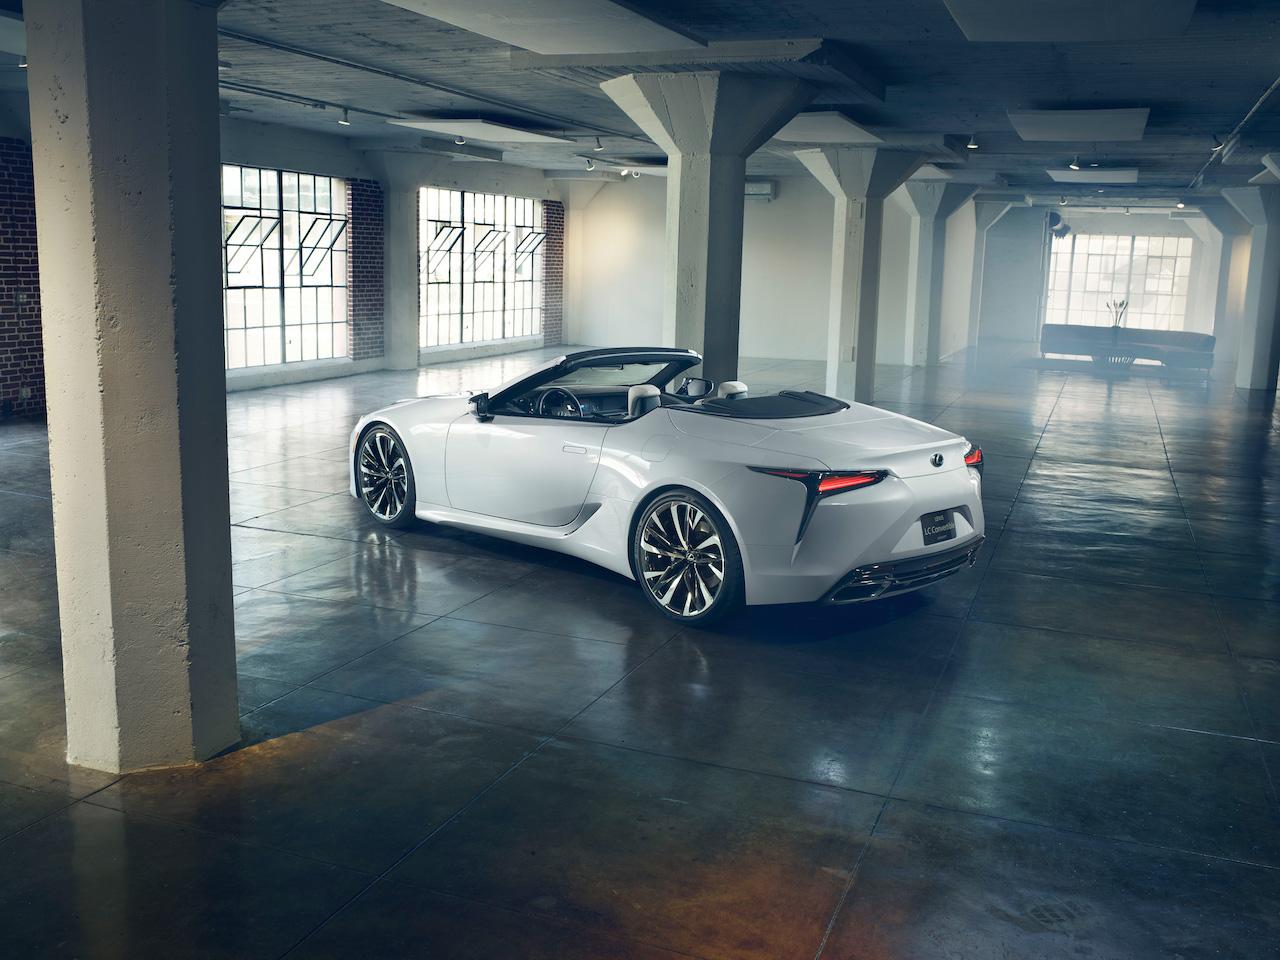 lexus-lc-convertible-concept-7